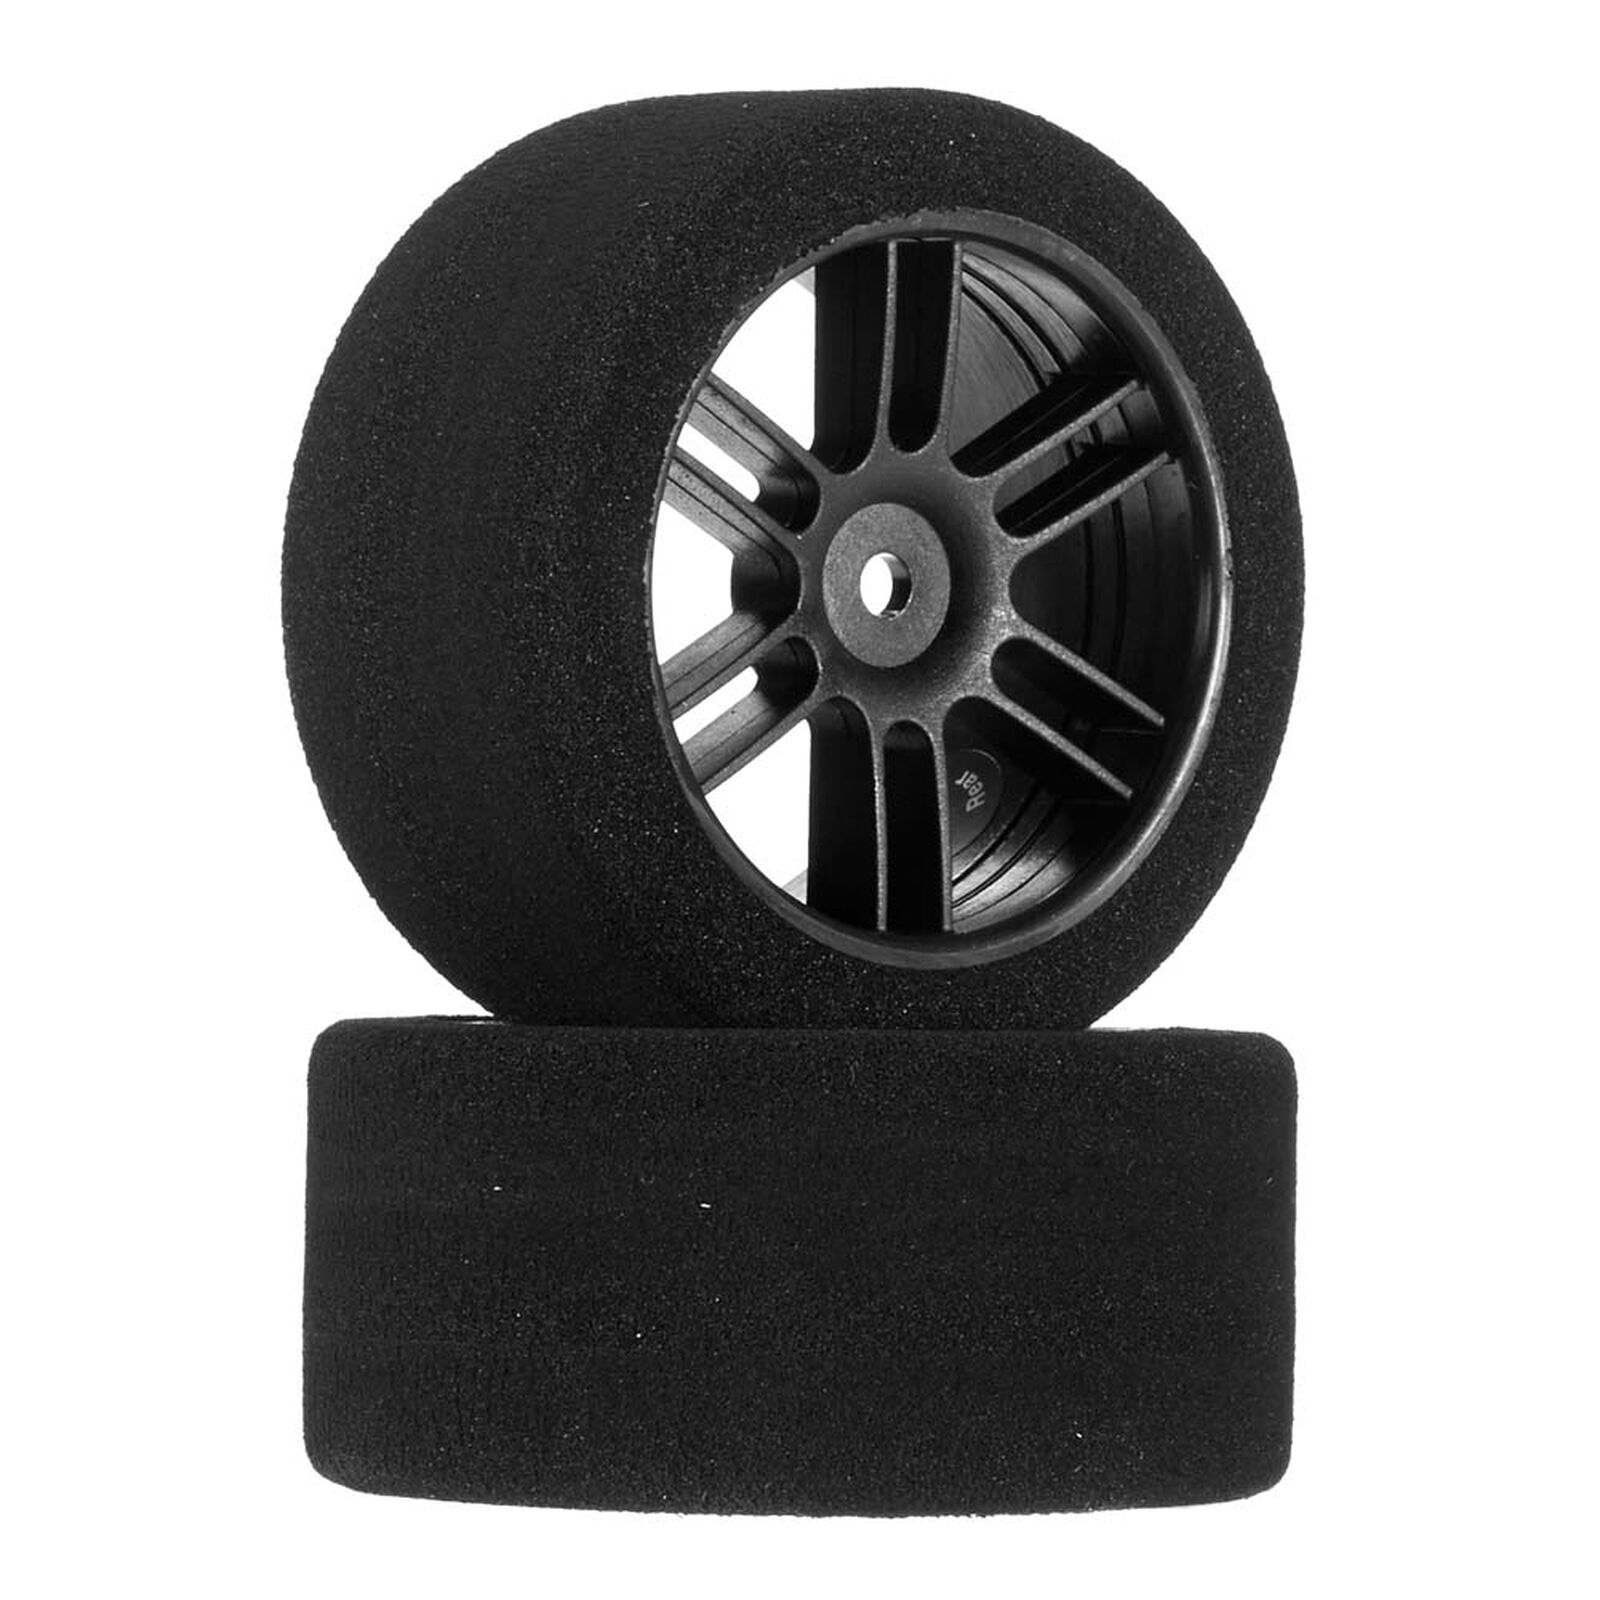 1/10 30mm Nitro Touring Foam Tires, Mounted, 35 Rear, Black Wheels (2)